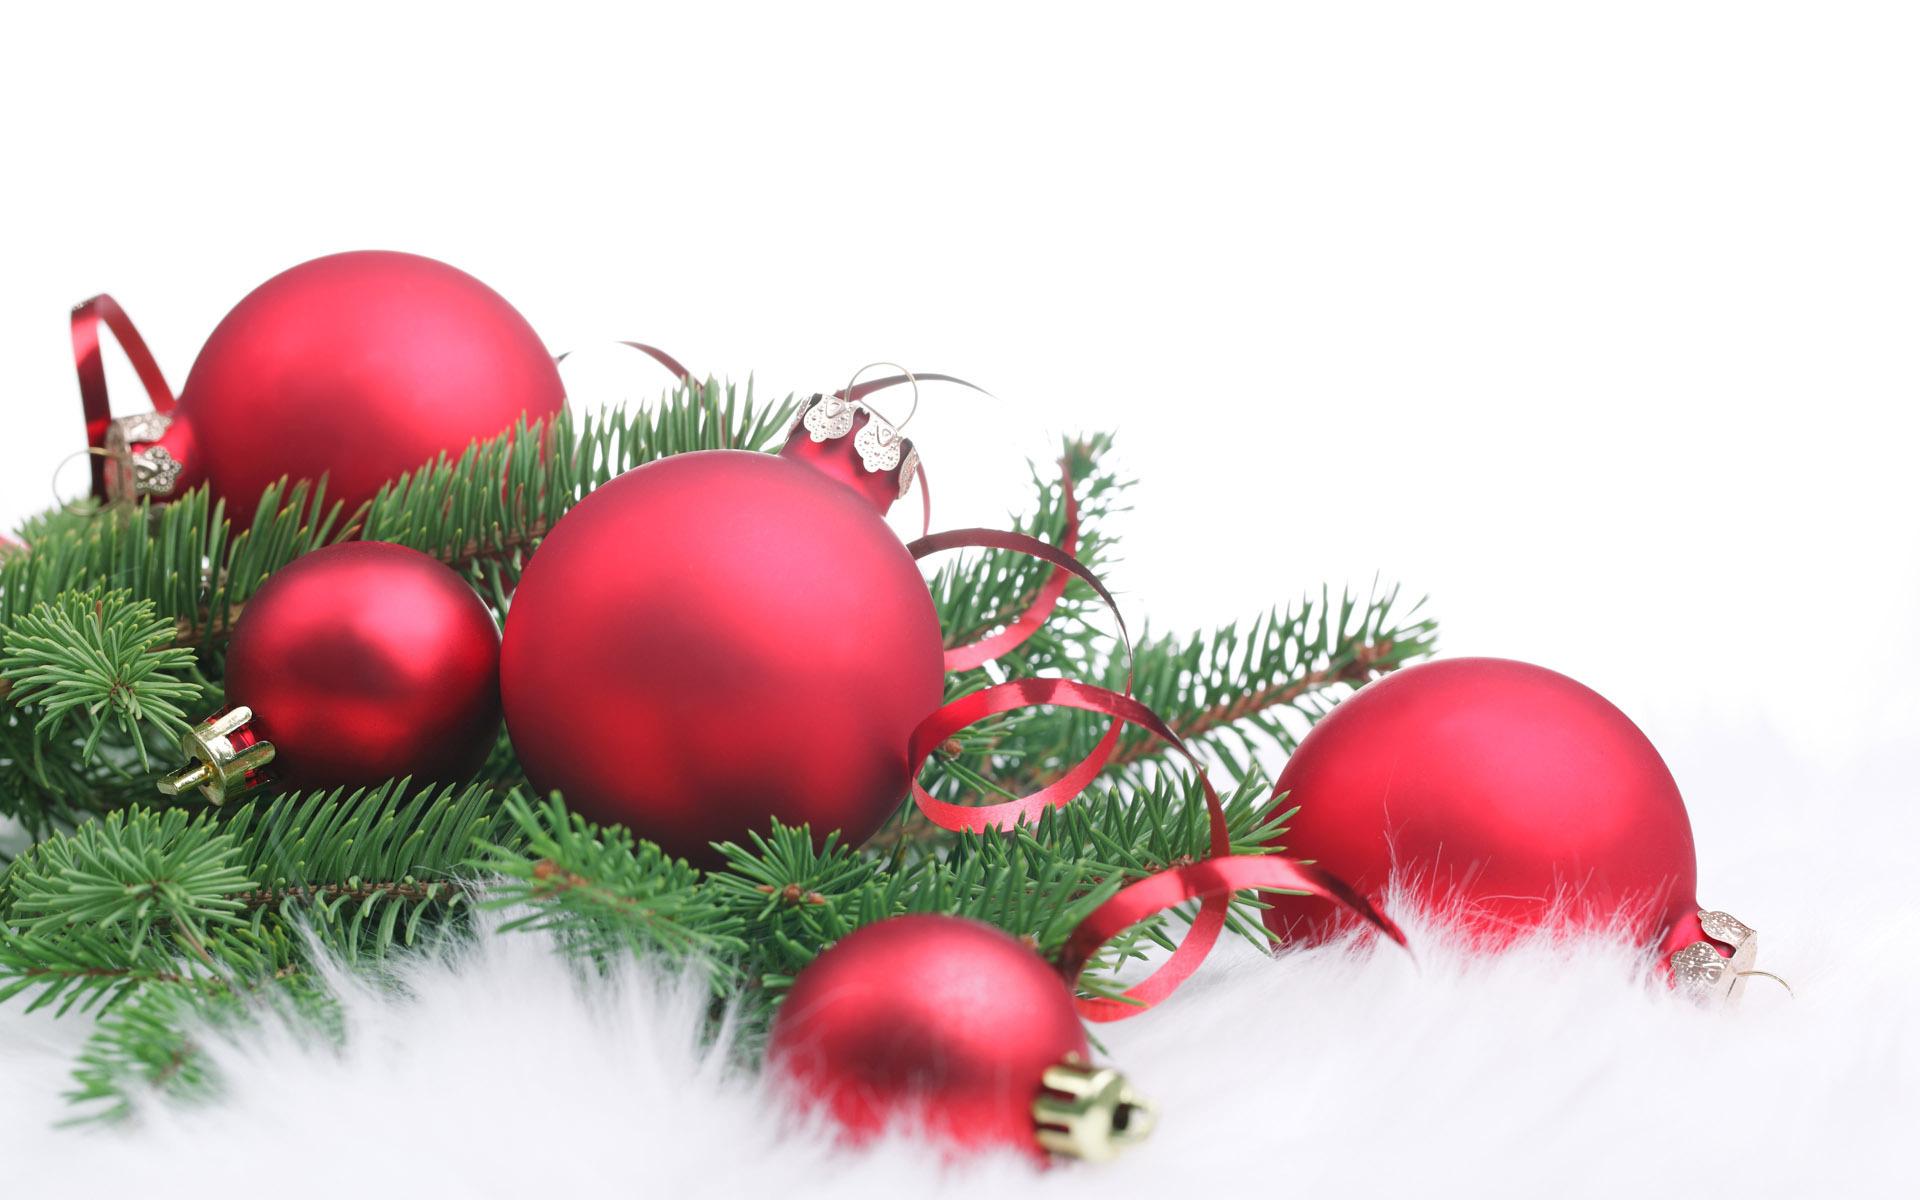 Red Christmas Decorations - Tierra Este | #78720